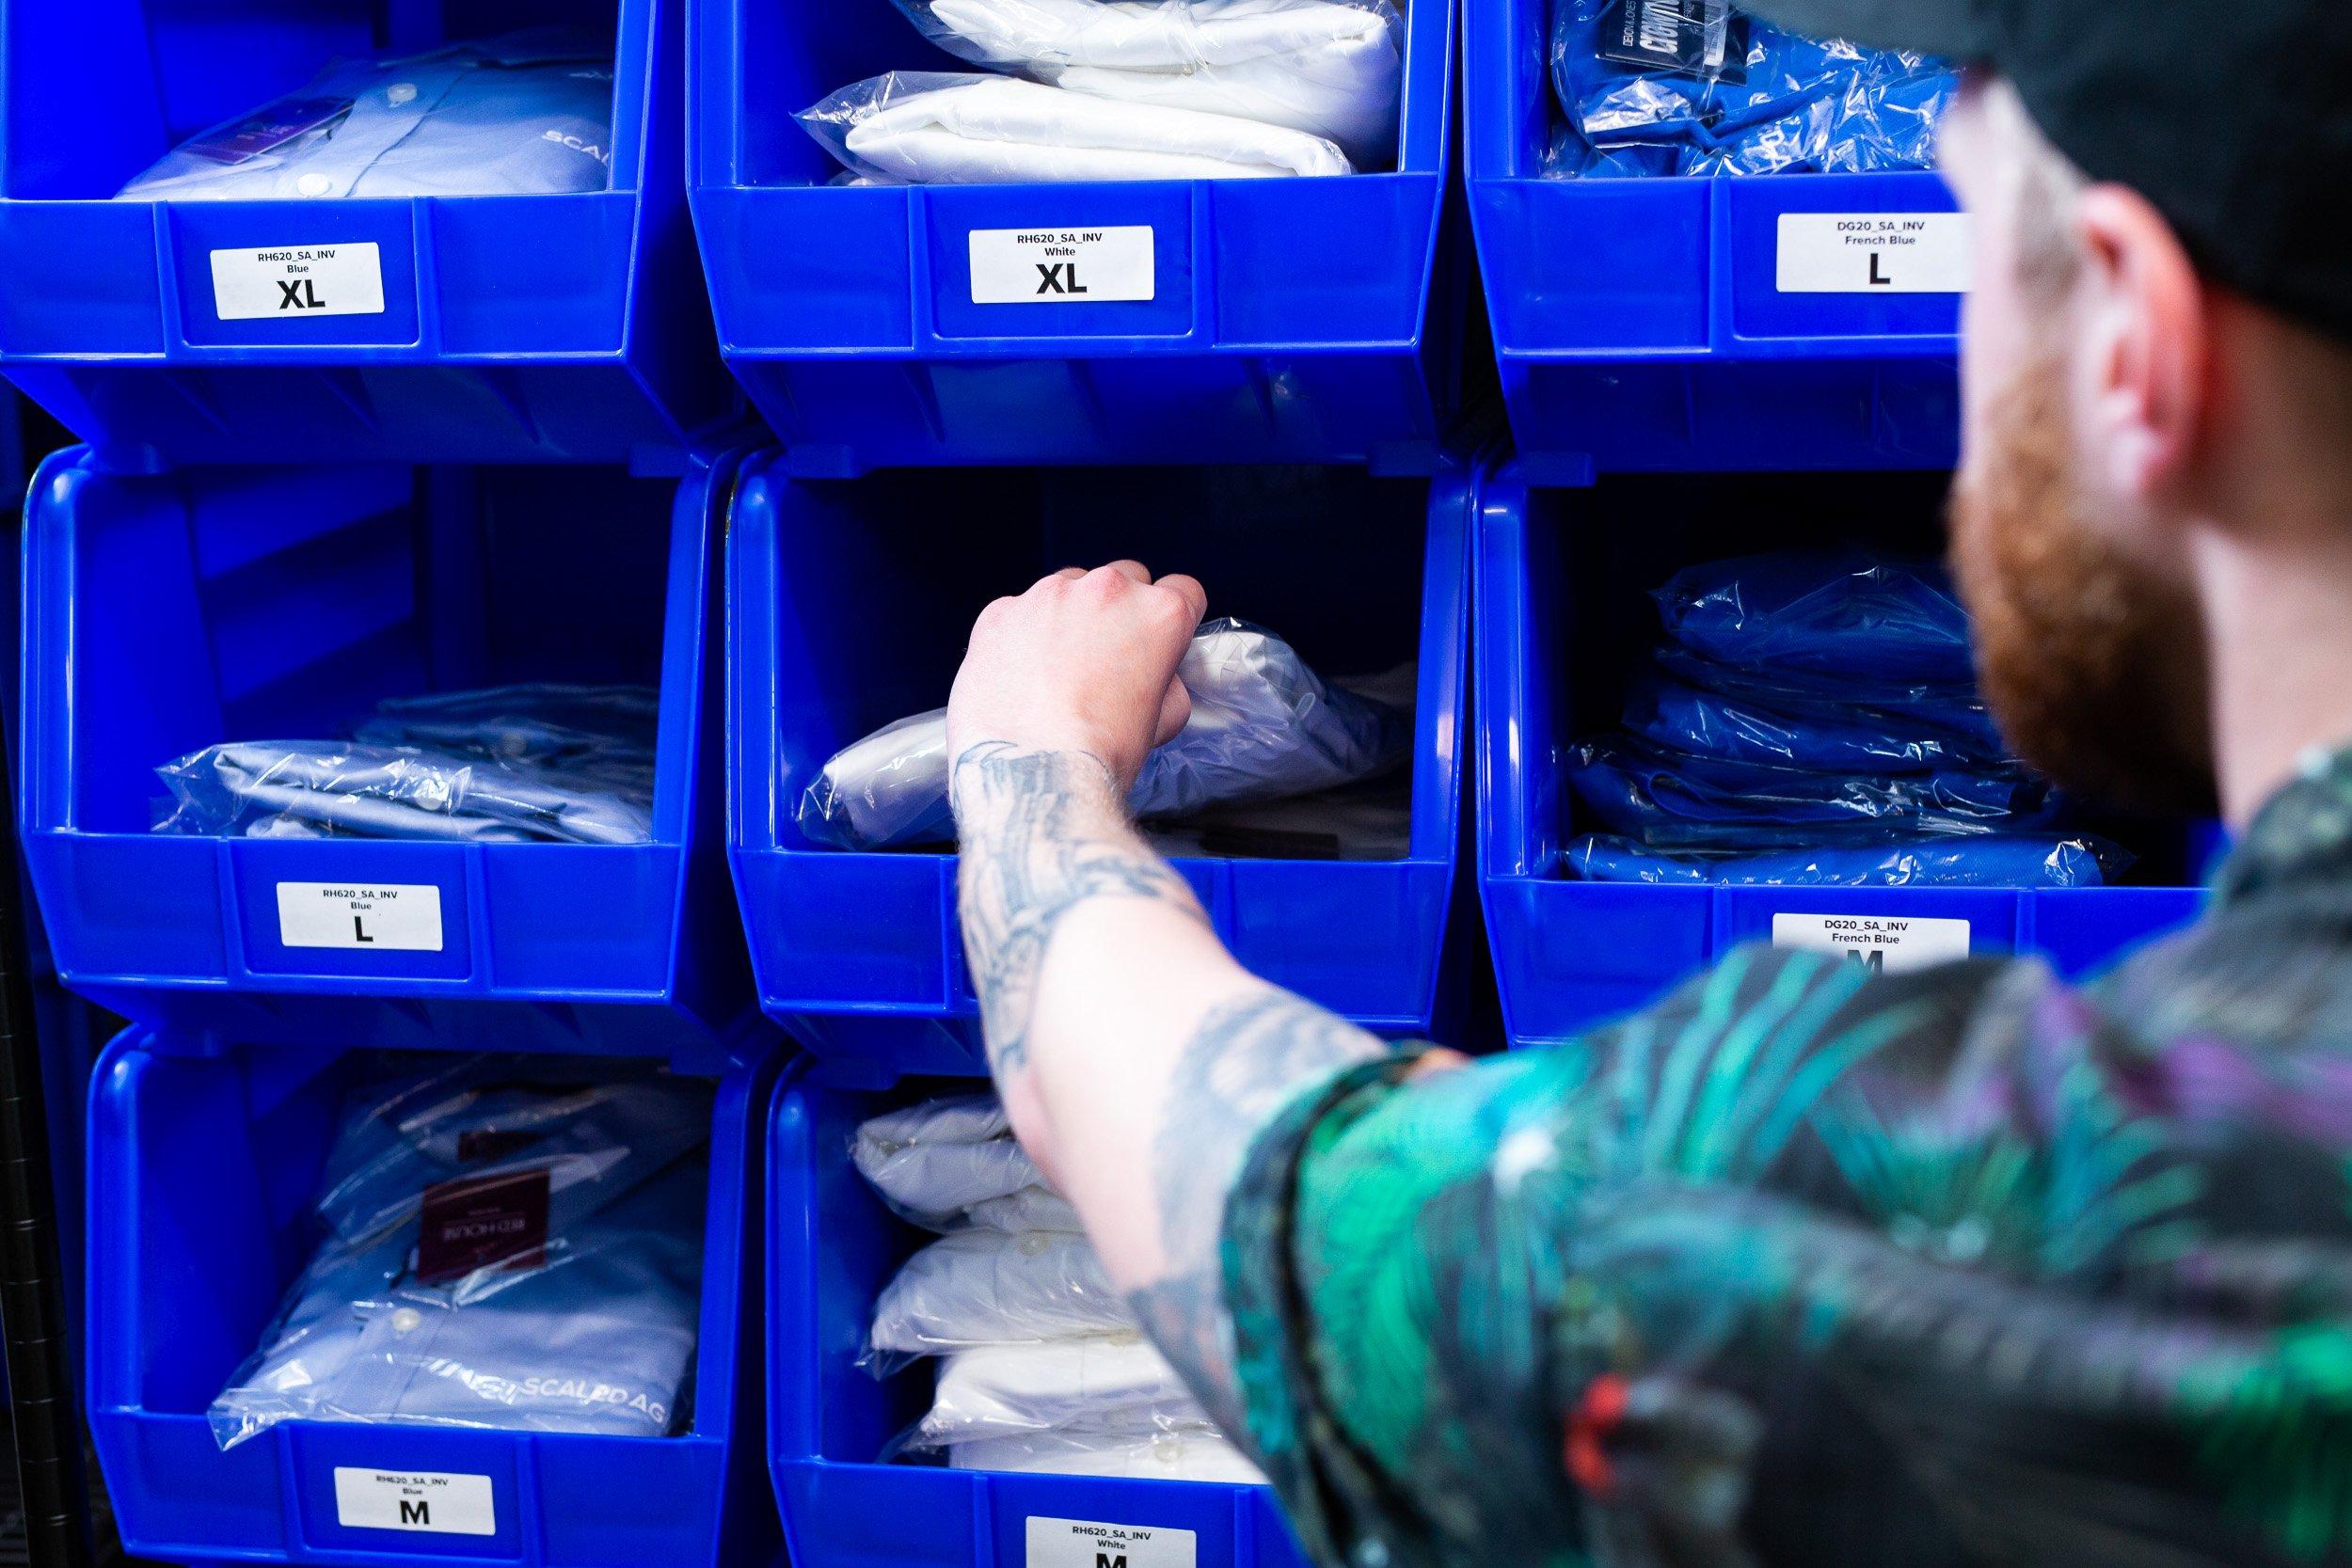 Tactive employee fulfills an e-shop order